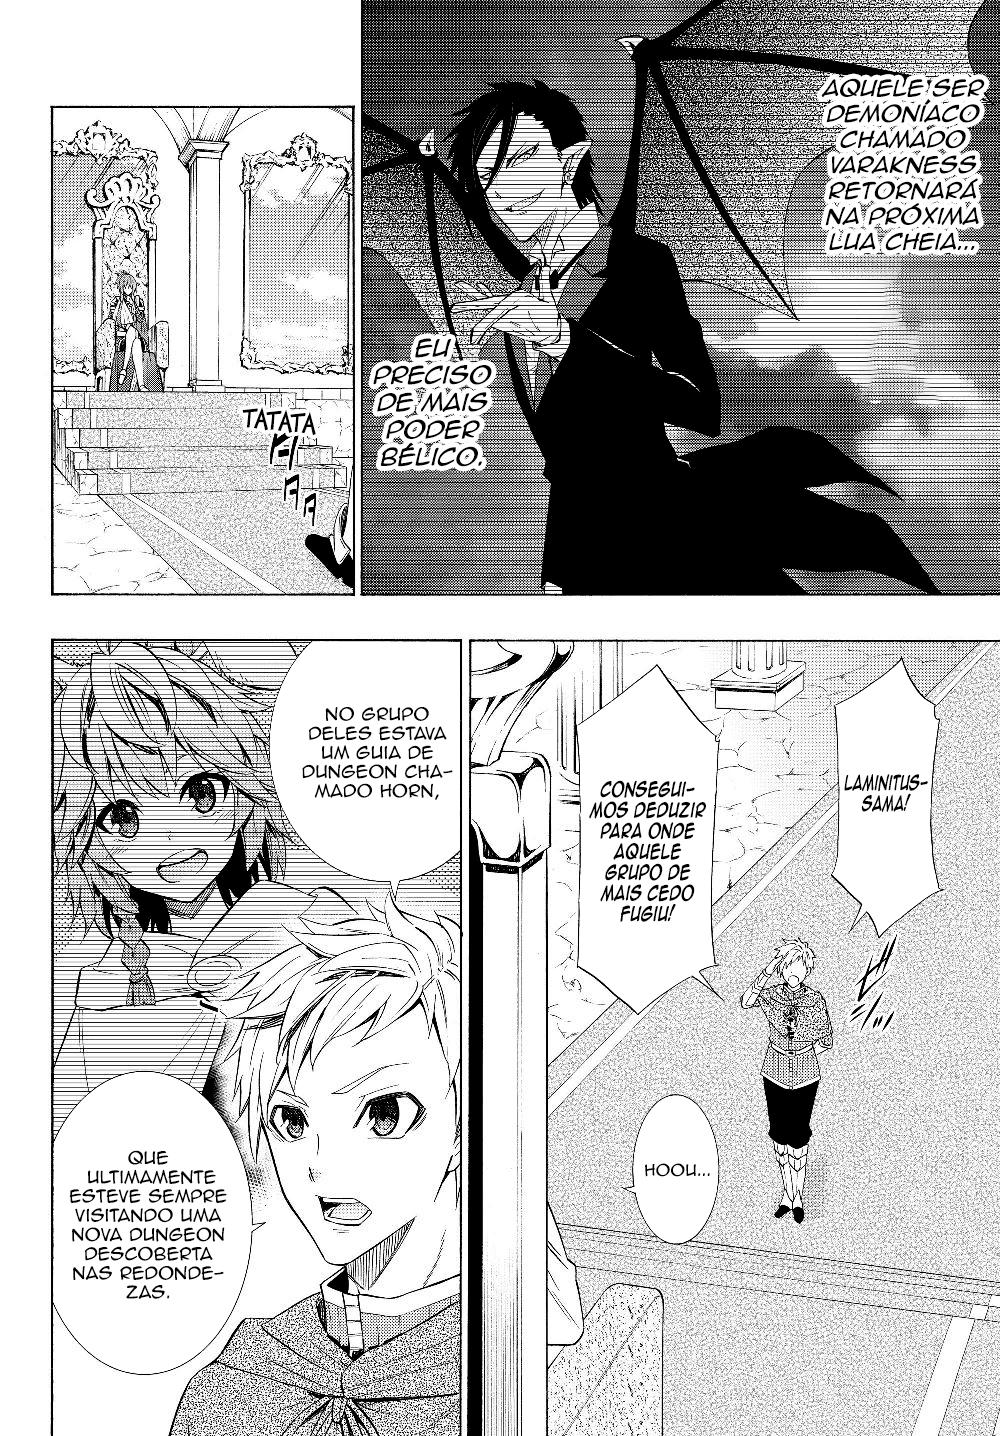 Isekai Maou to Shoukan Shoujo no Dorei Majutsu / How NOT To Summon a Demon Lord Mangá Online Capítulo 53 em Português